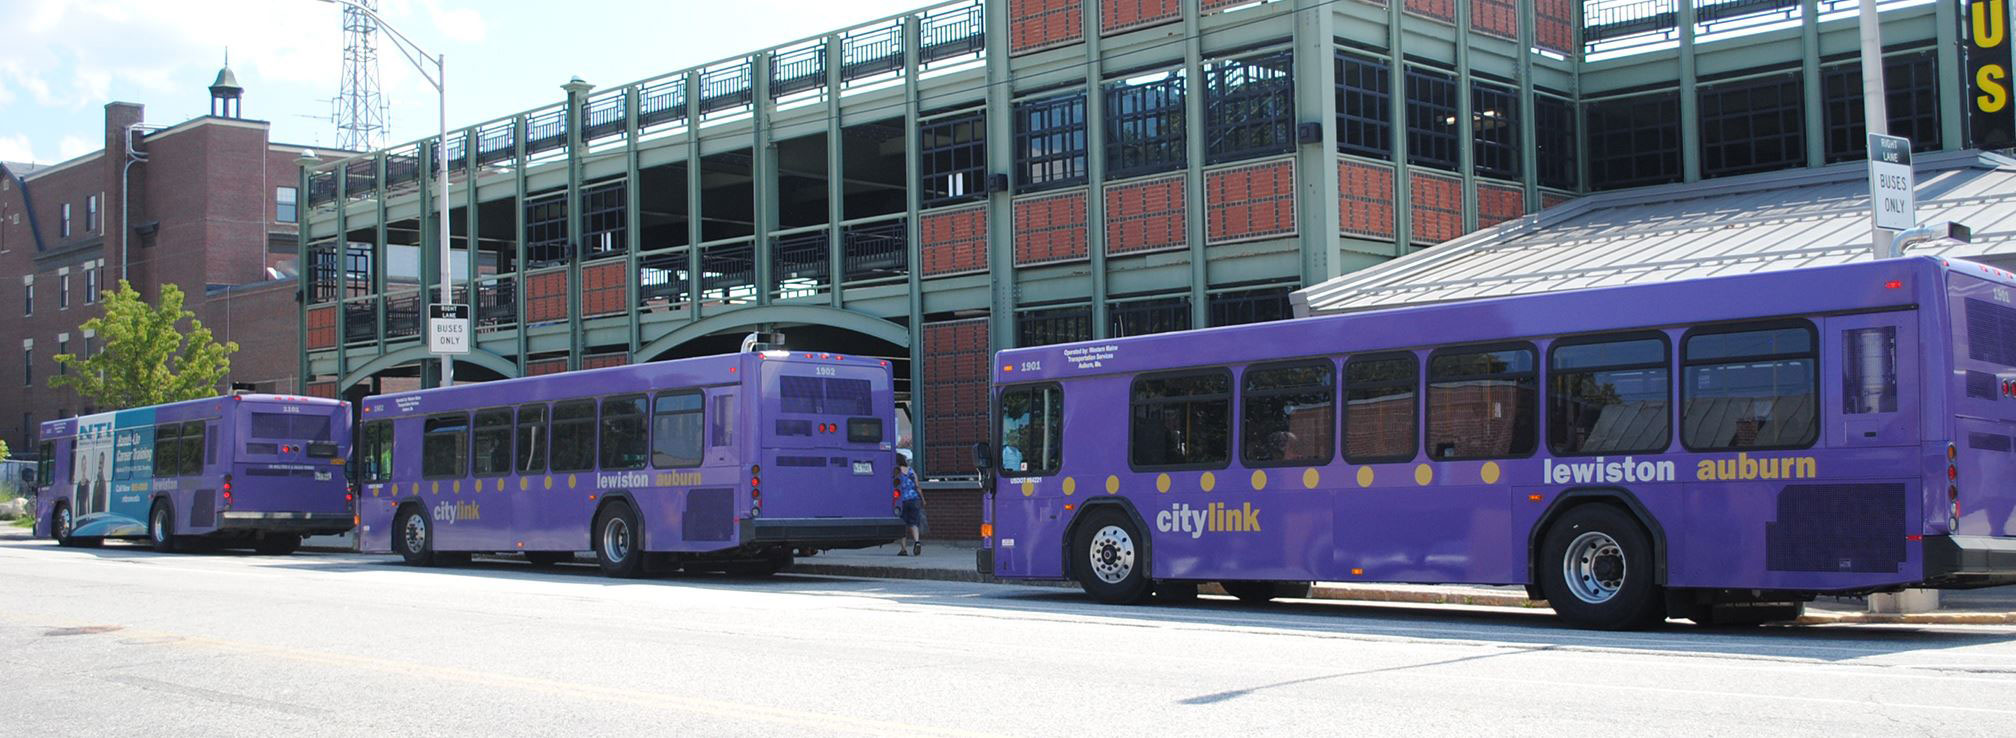 Buses in Lewiston-Auburn